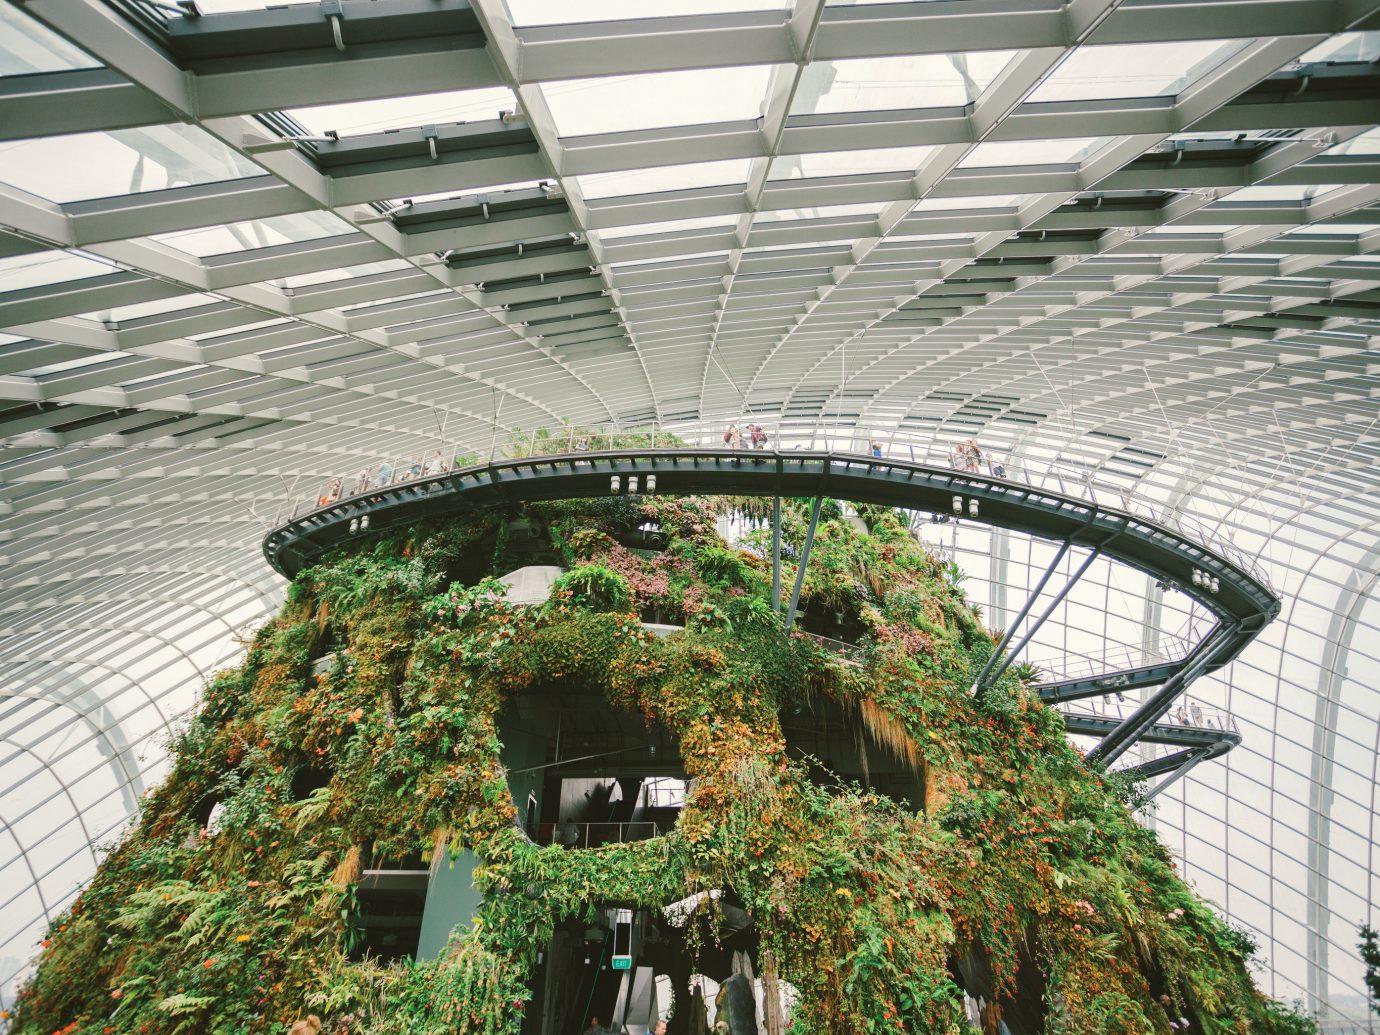 Offbeat Singapore Trip Ideas structure building outdoor sport venue Architecture stadium arena skyway greenhouse court